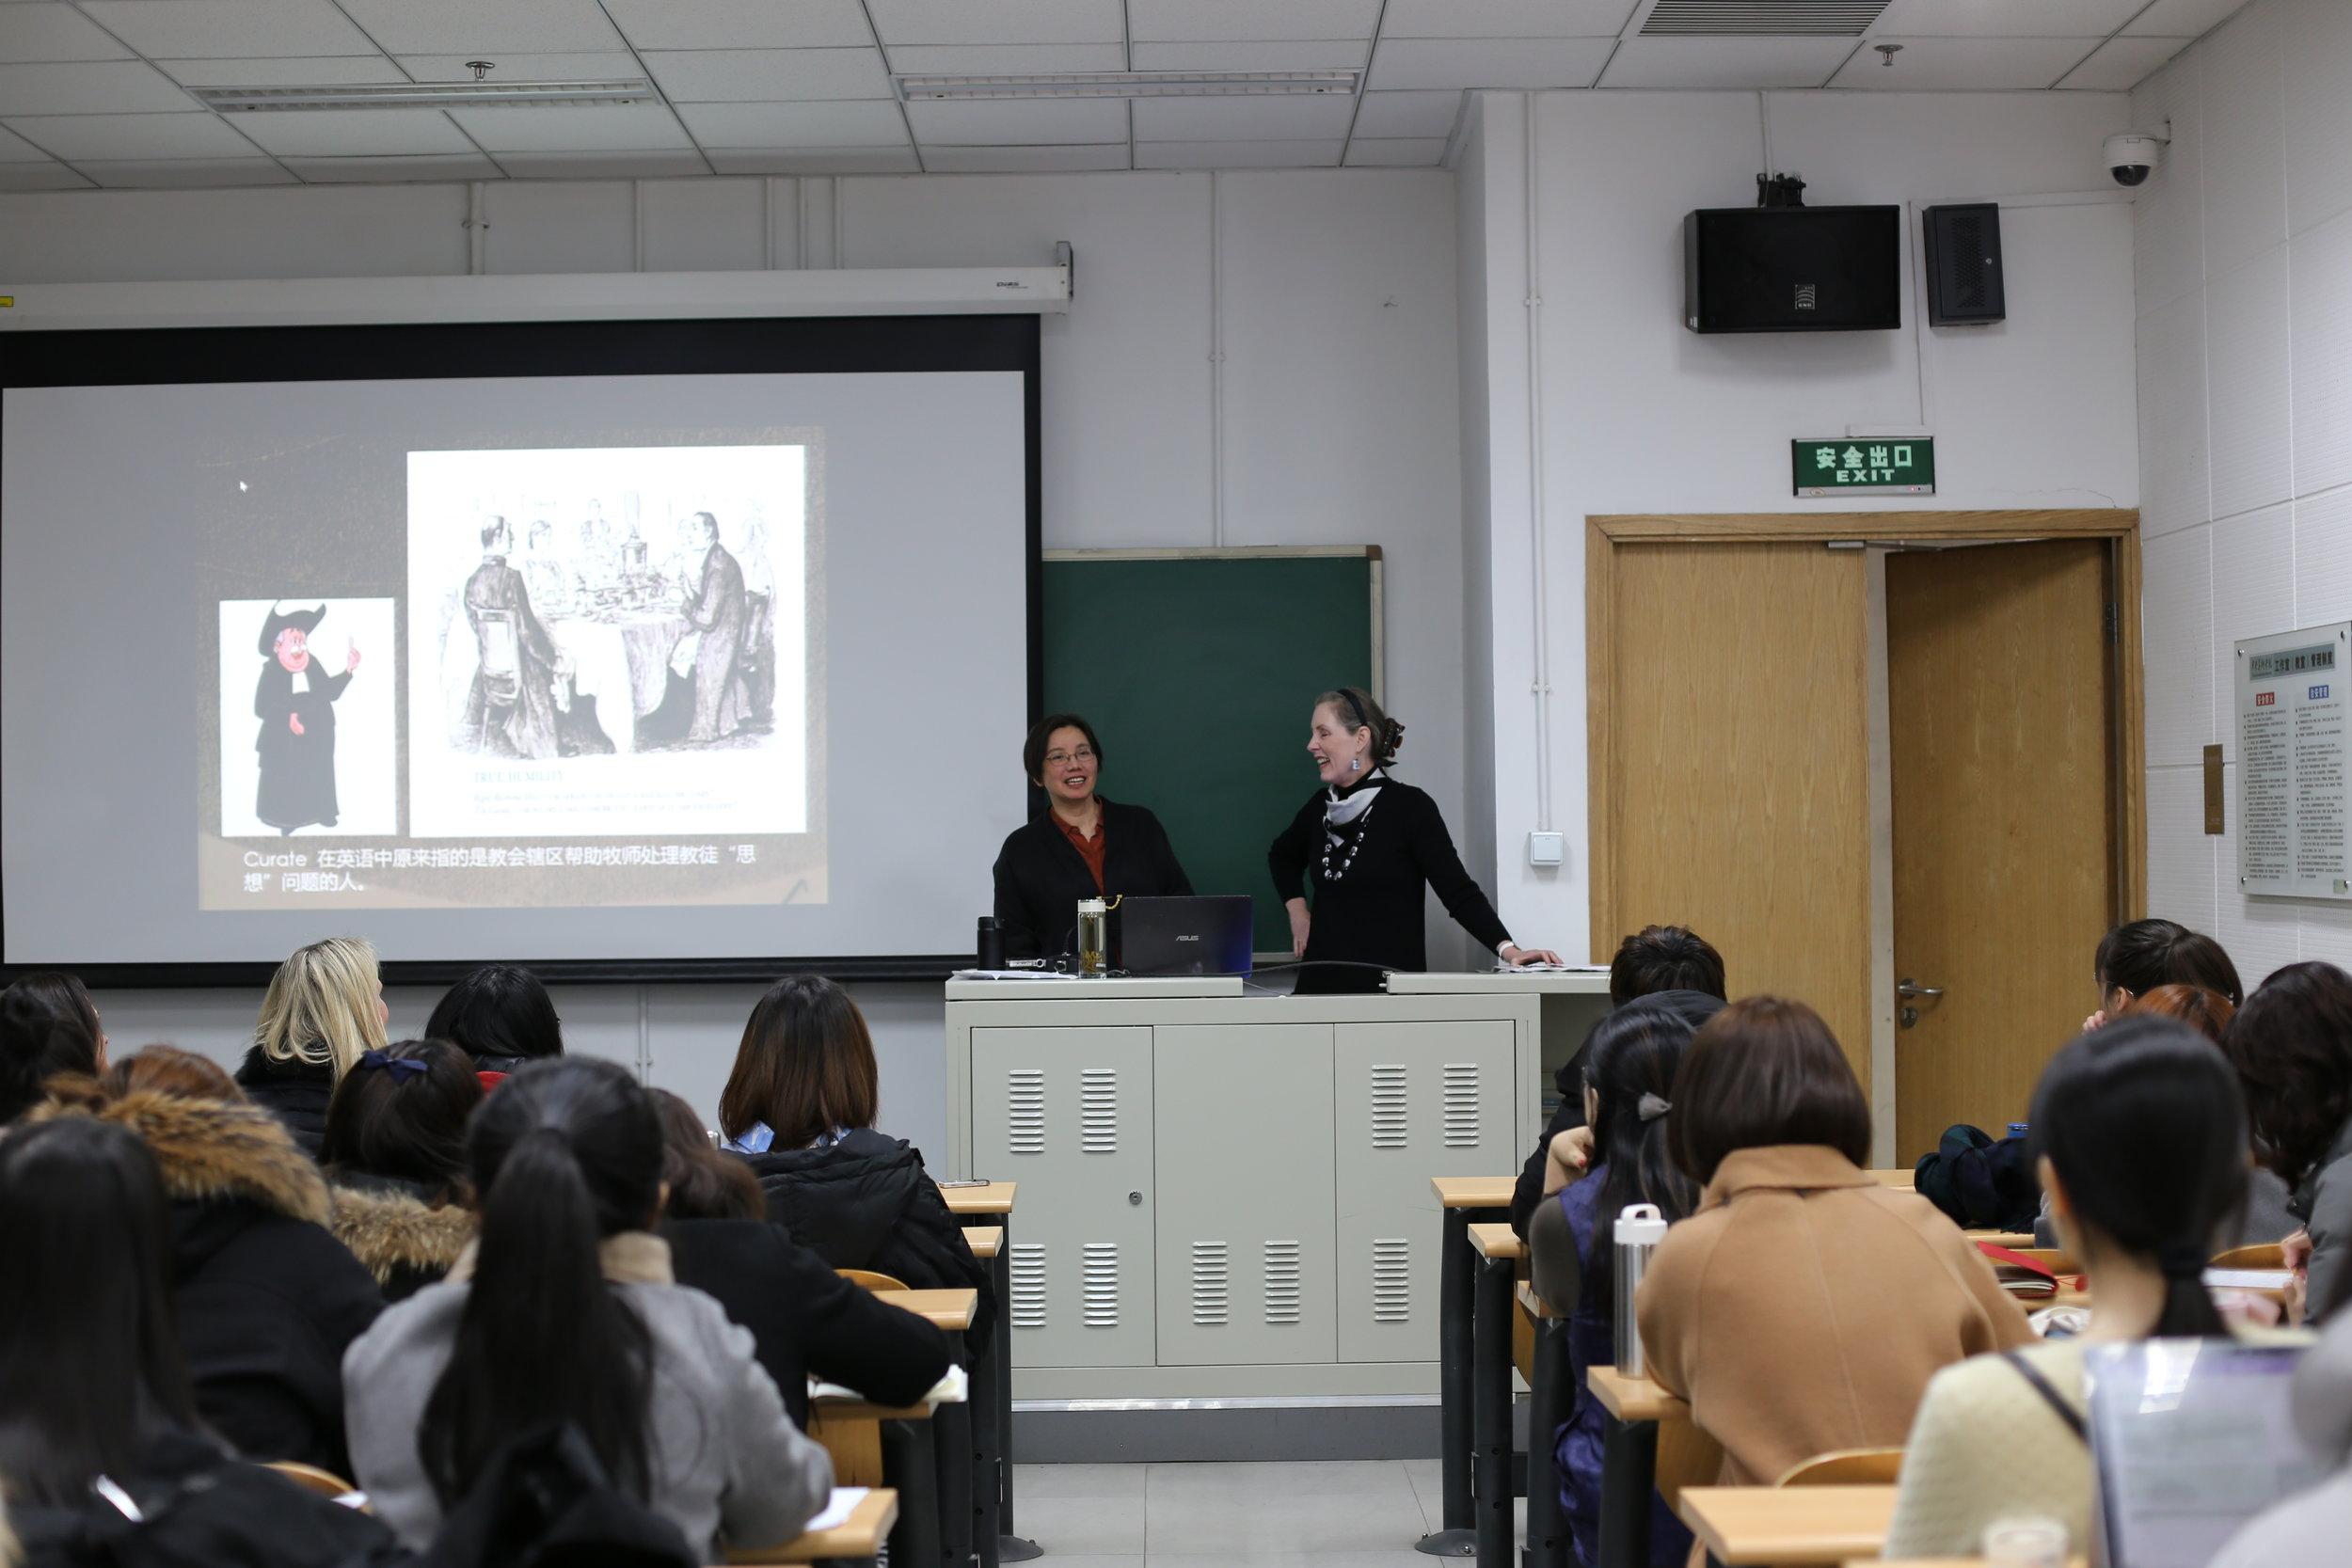 Professor Tao and Kathrine